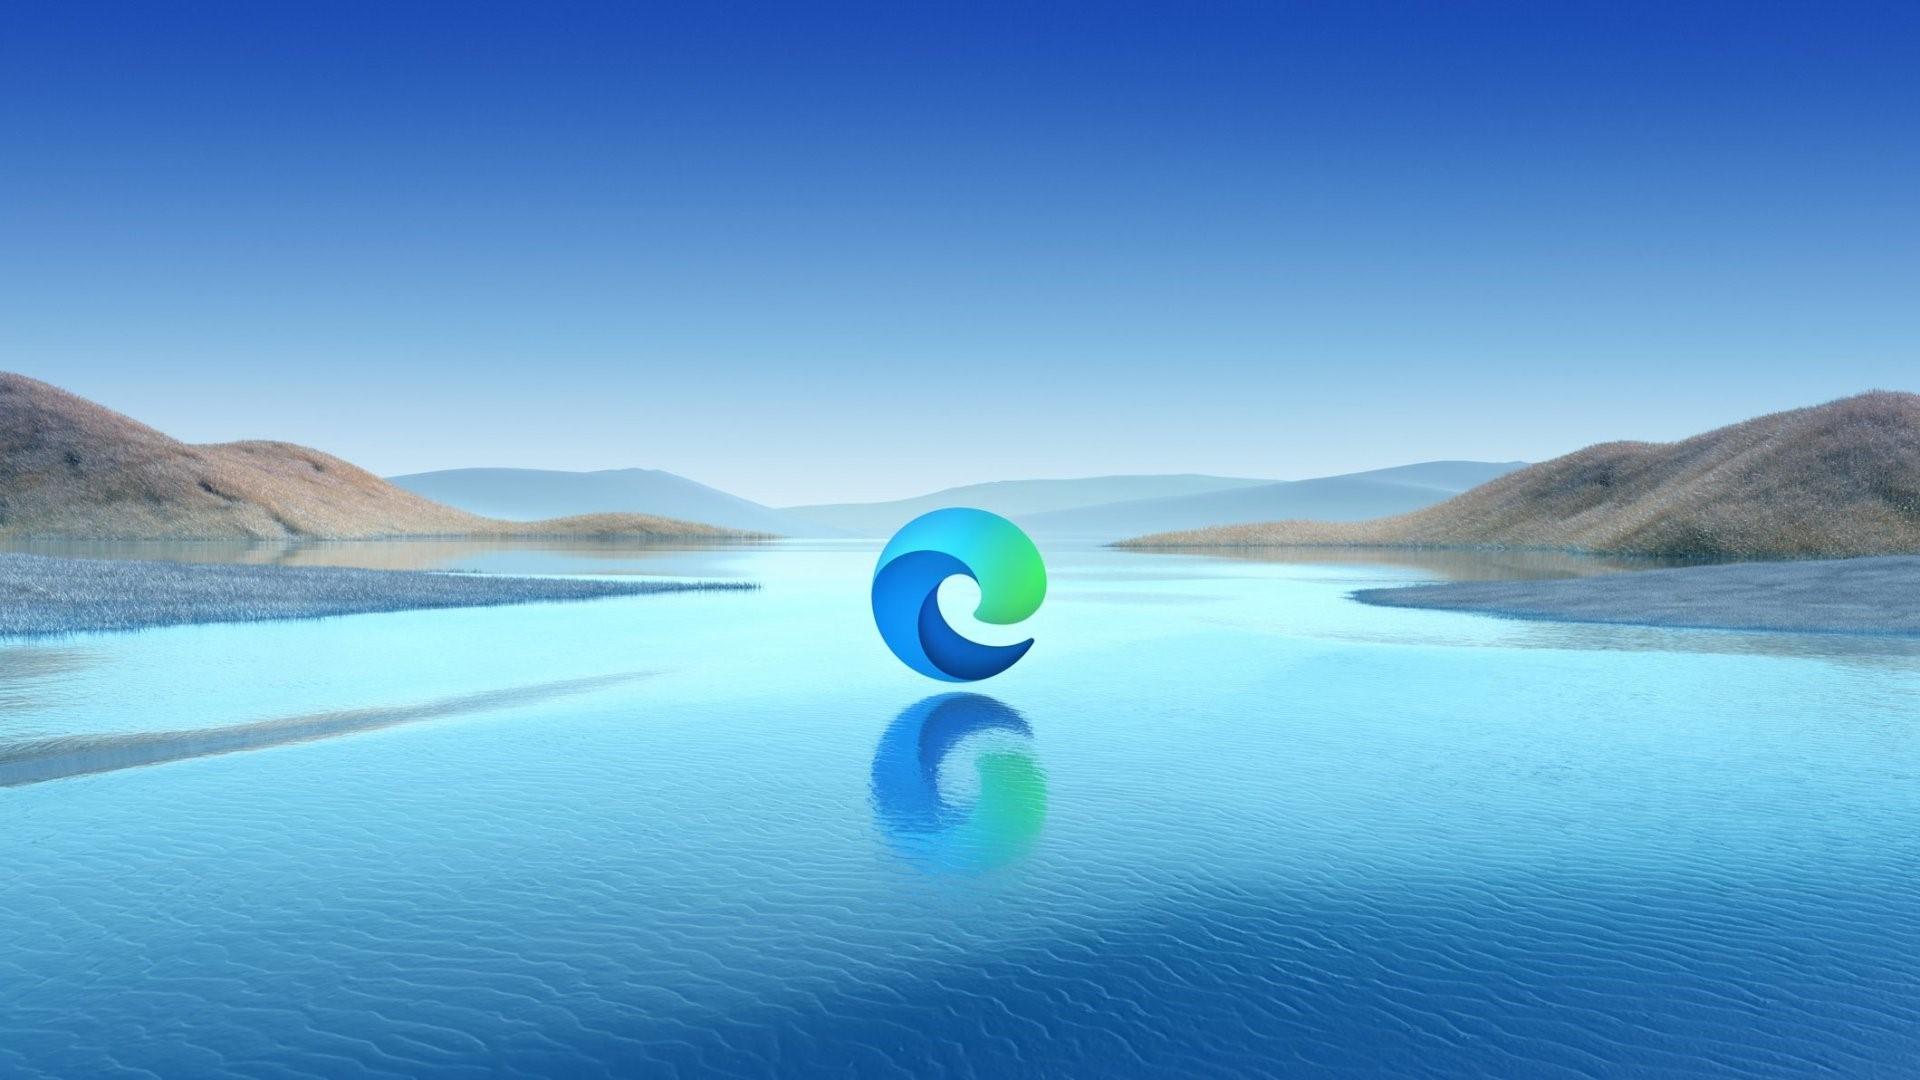 #Microsoft,#Edge,#Browser,#Chromium,Ratgeber,Tipps,Tricks,Hilfe,Anleitungen,FAQ,Ratgeber,Edge ...jpg